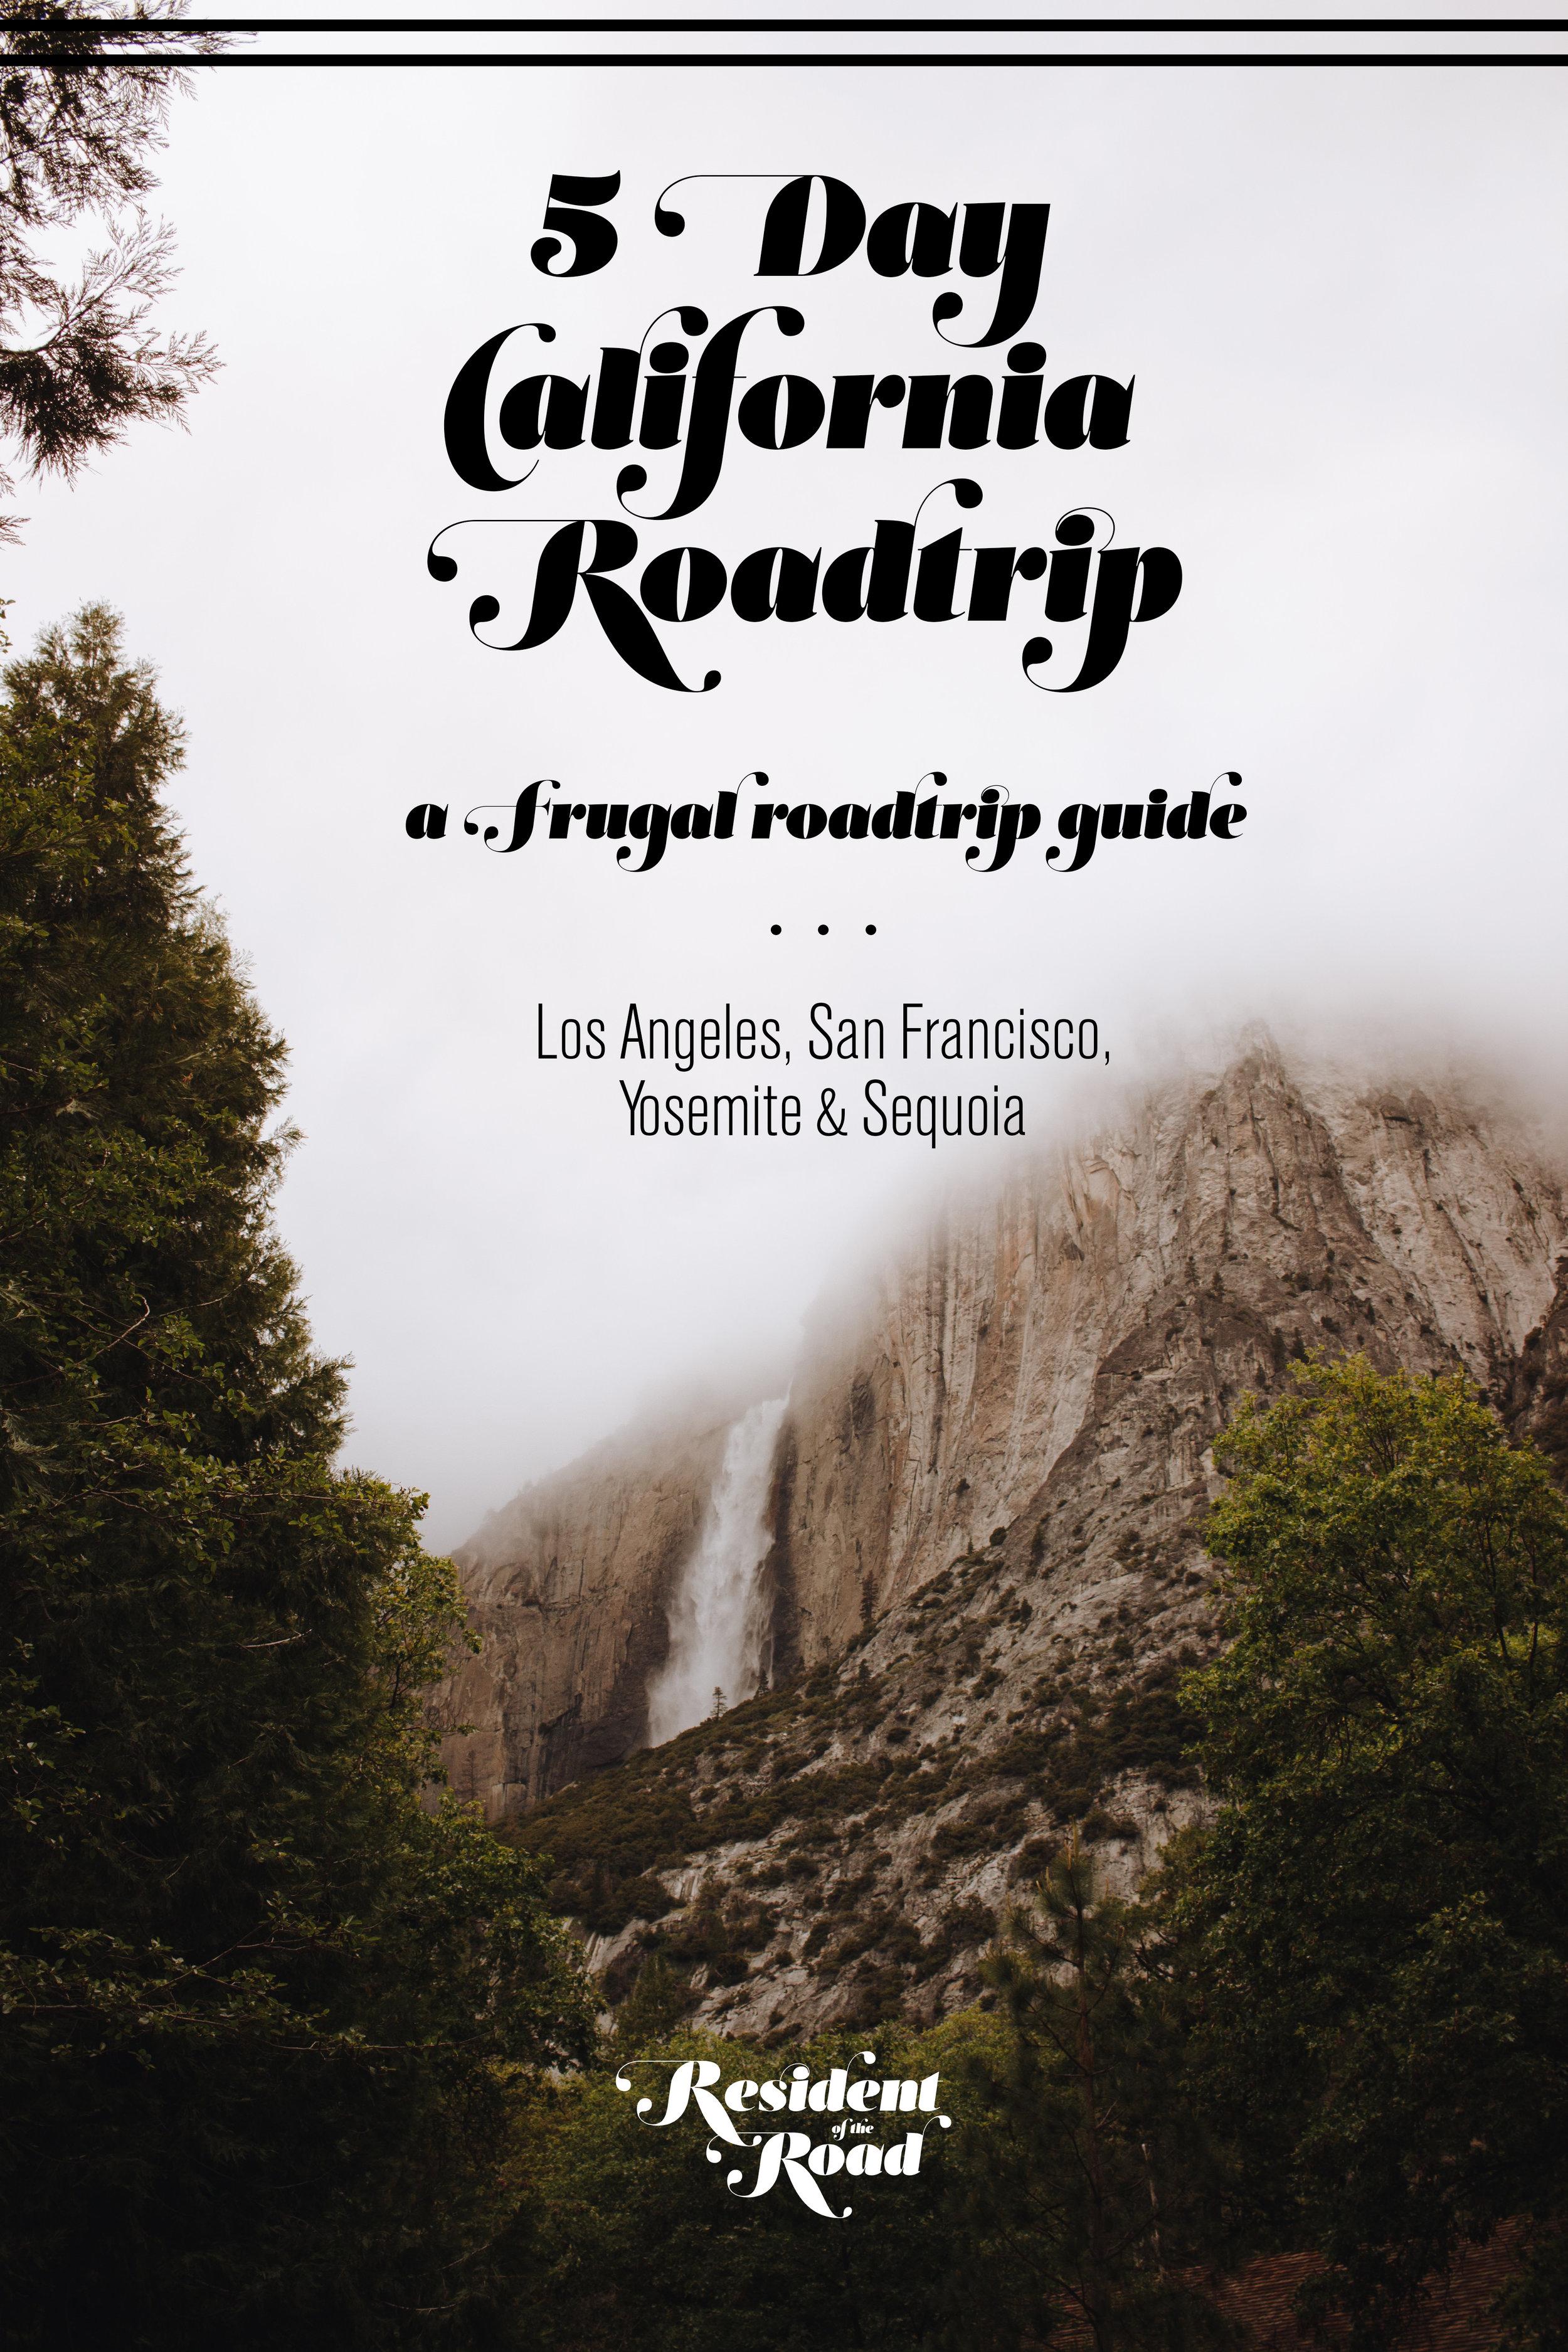 Your ultimate 5 day California roadtrip to LA, San Francisco, Yosemite and Sequoia || @ResidentoftheRoad